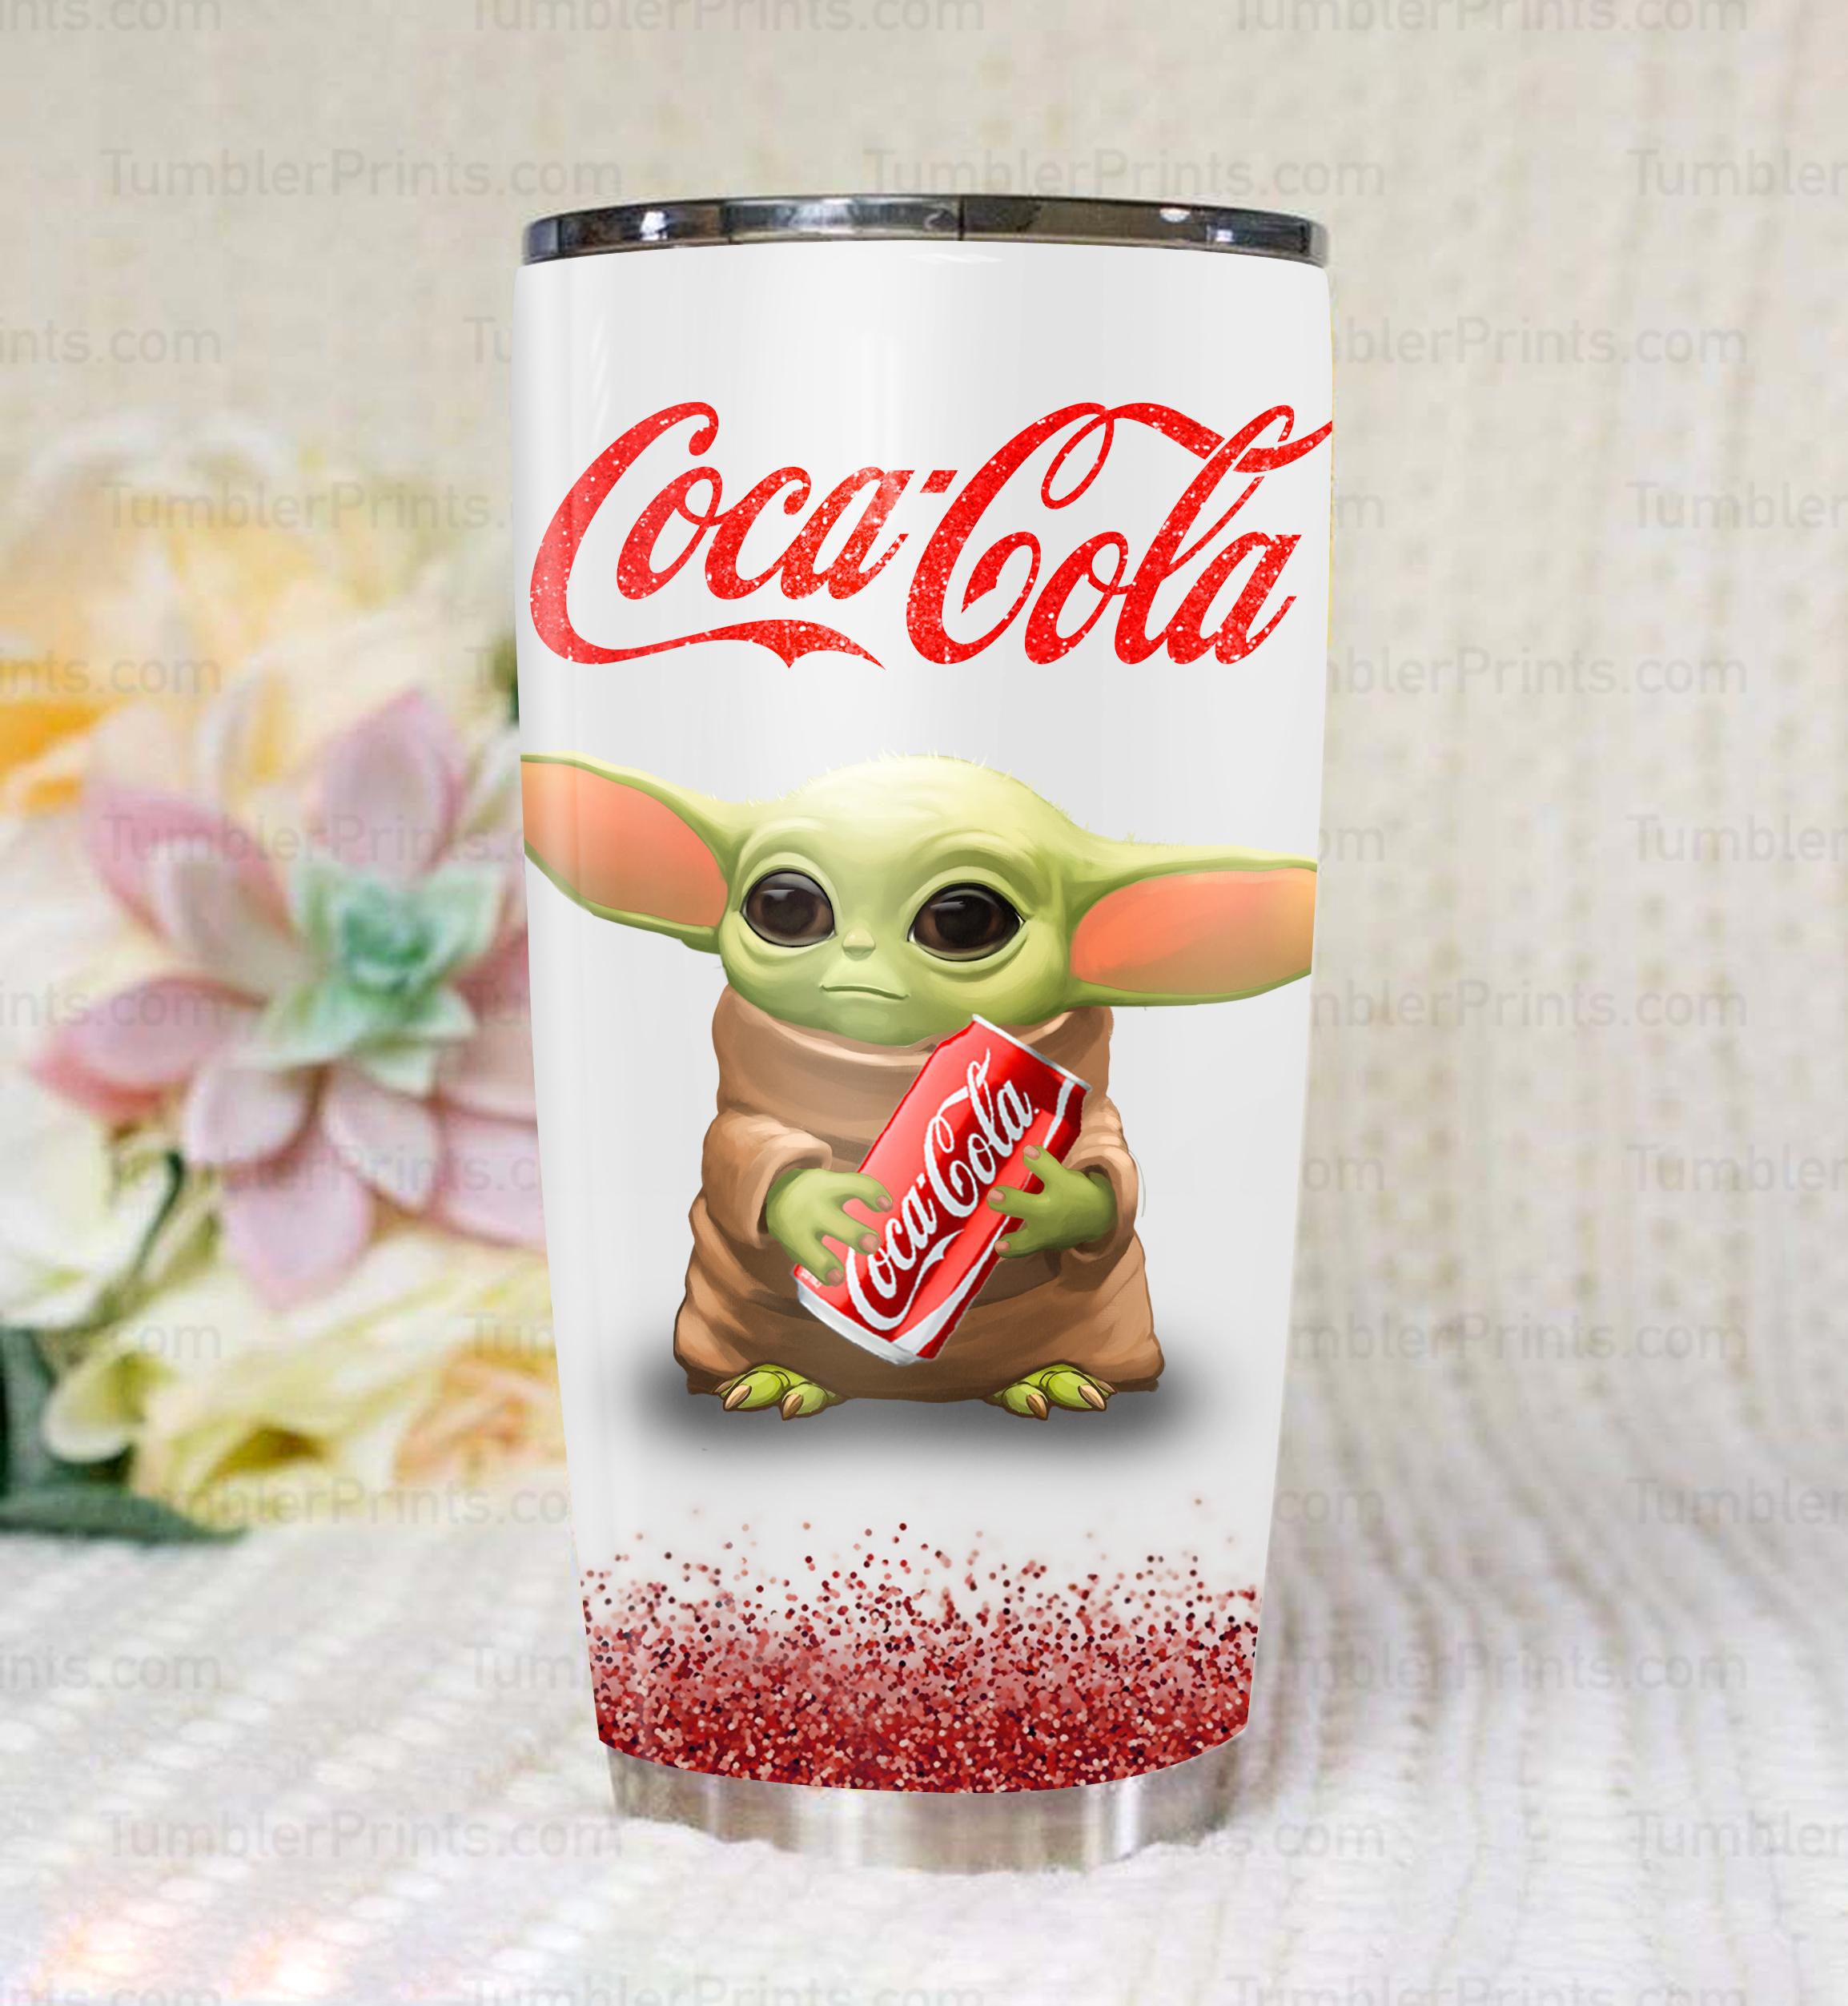 Baby yoda hold coca cola steel tumbler 3